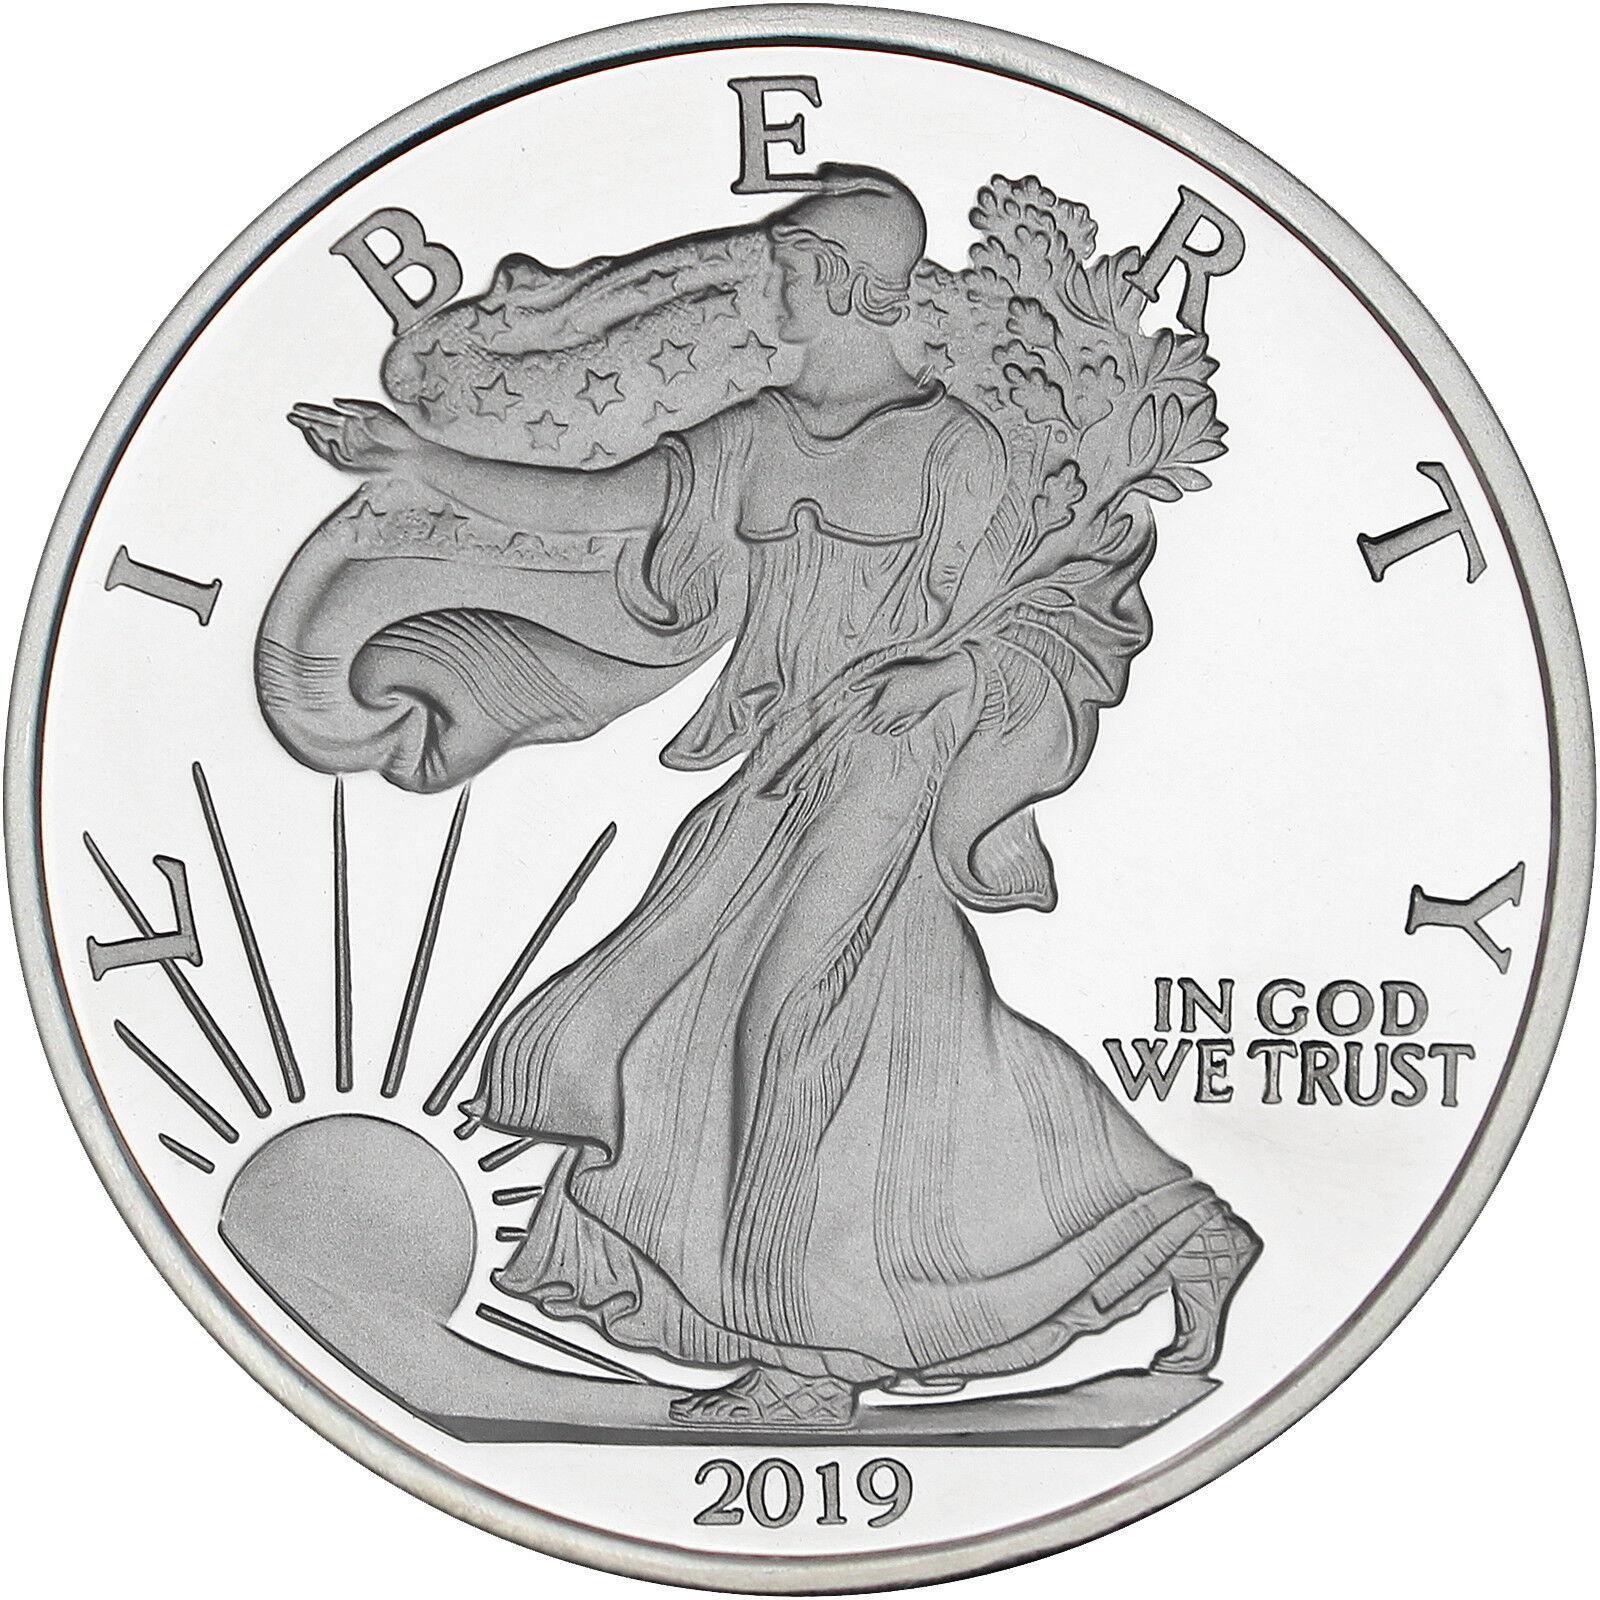 Купить Silvertowne 2019 Silver American Eagle 5oz .999 Silver Medallion